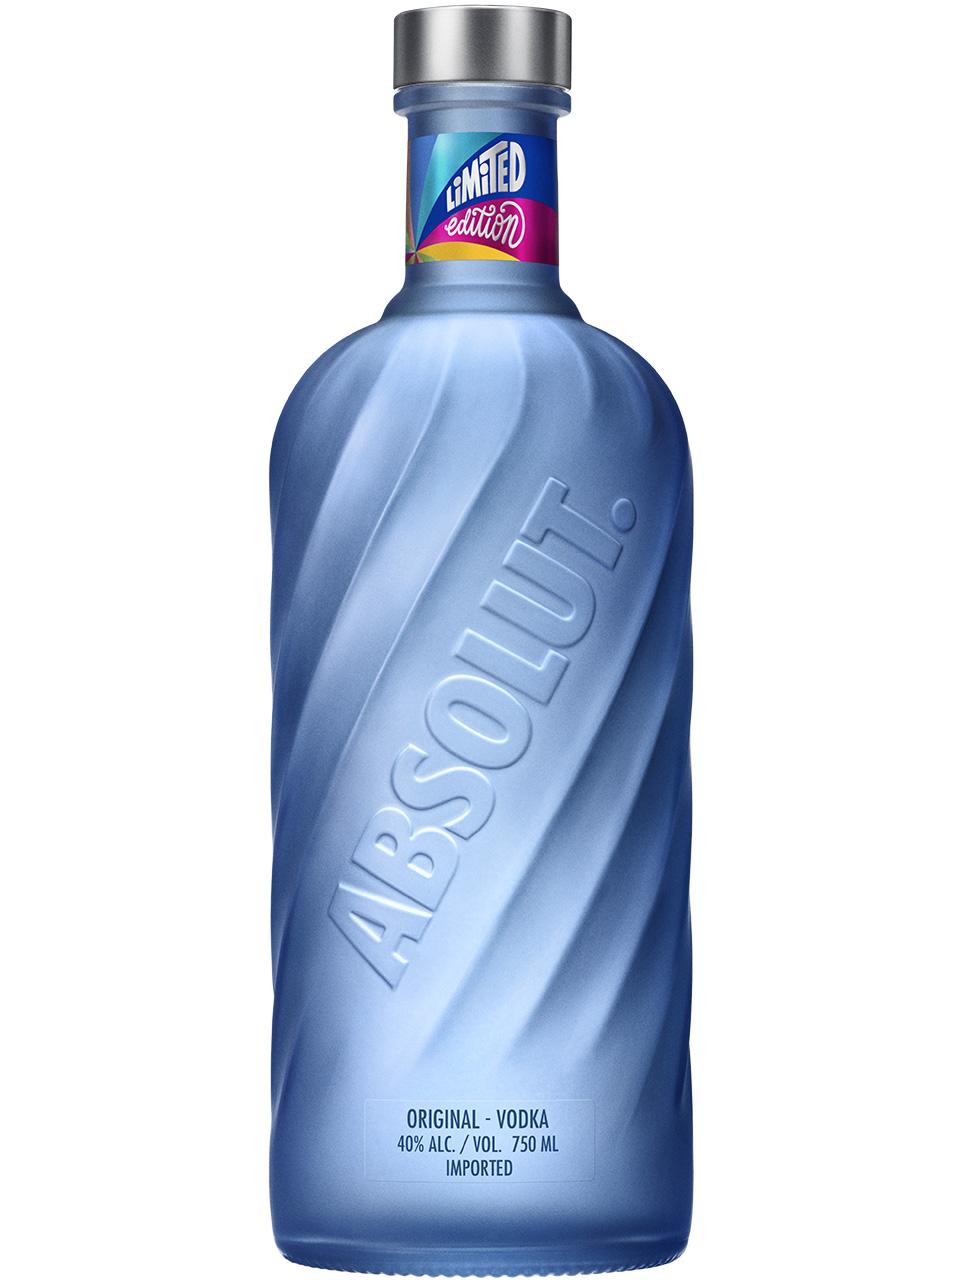 Absolut Swirl Limited Edition Bottle Vodka